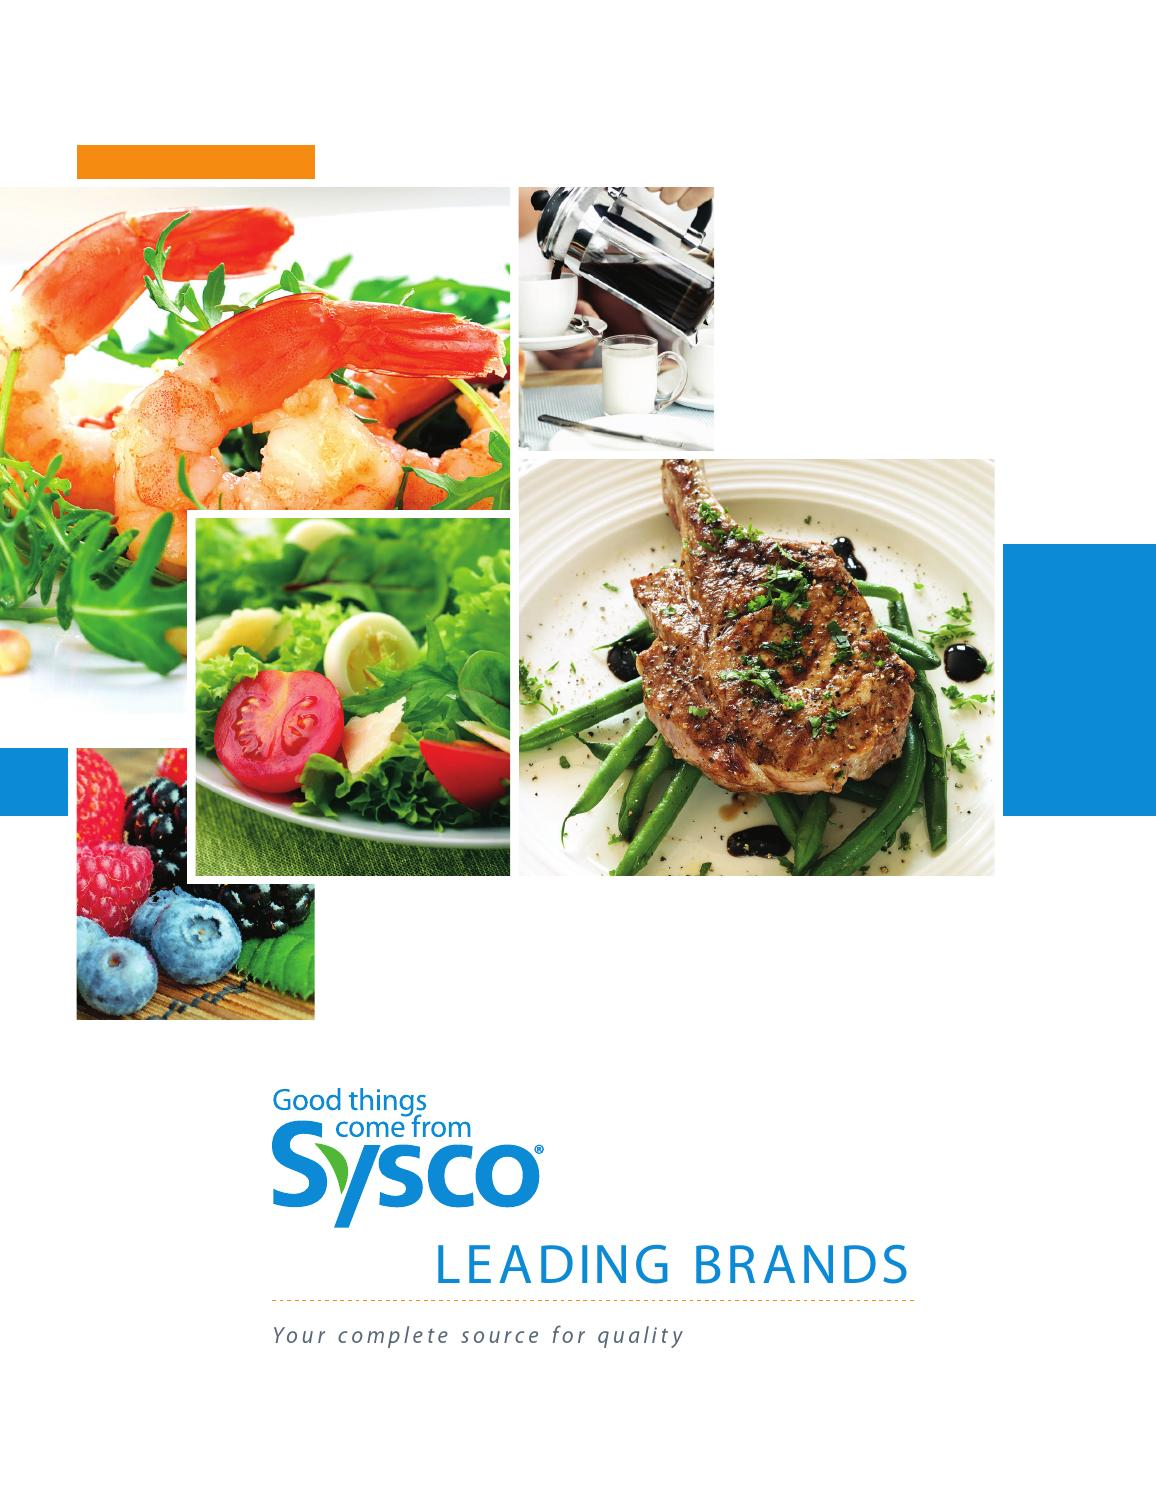 Sysco Brands Book 2015 By Sysco Hampton Roads Issuu